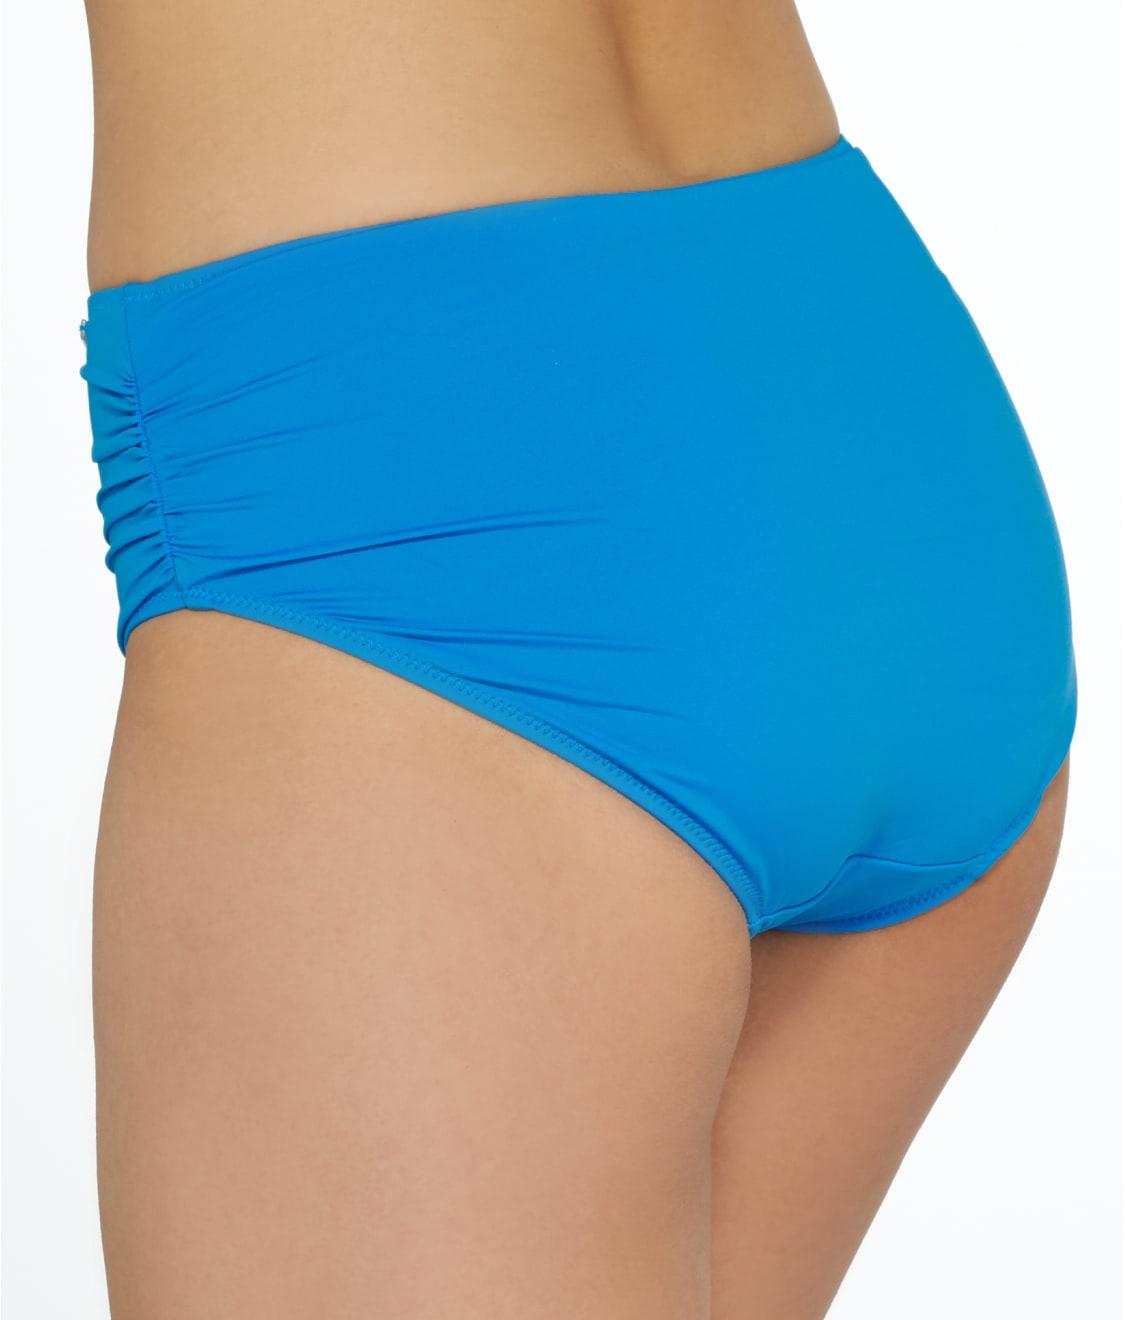 bf96e716afd33 See Versailles Deep Gathered Bikini Bottom in China Blue